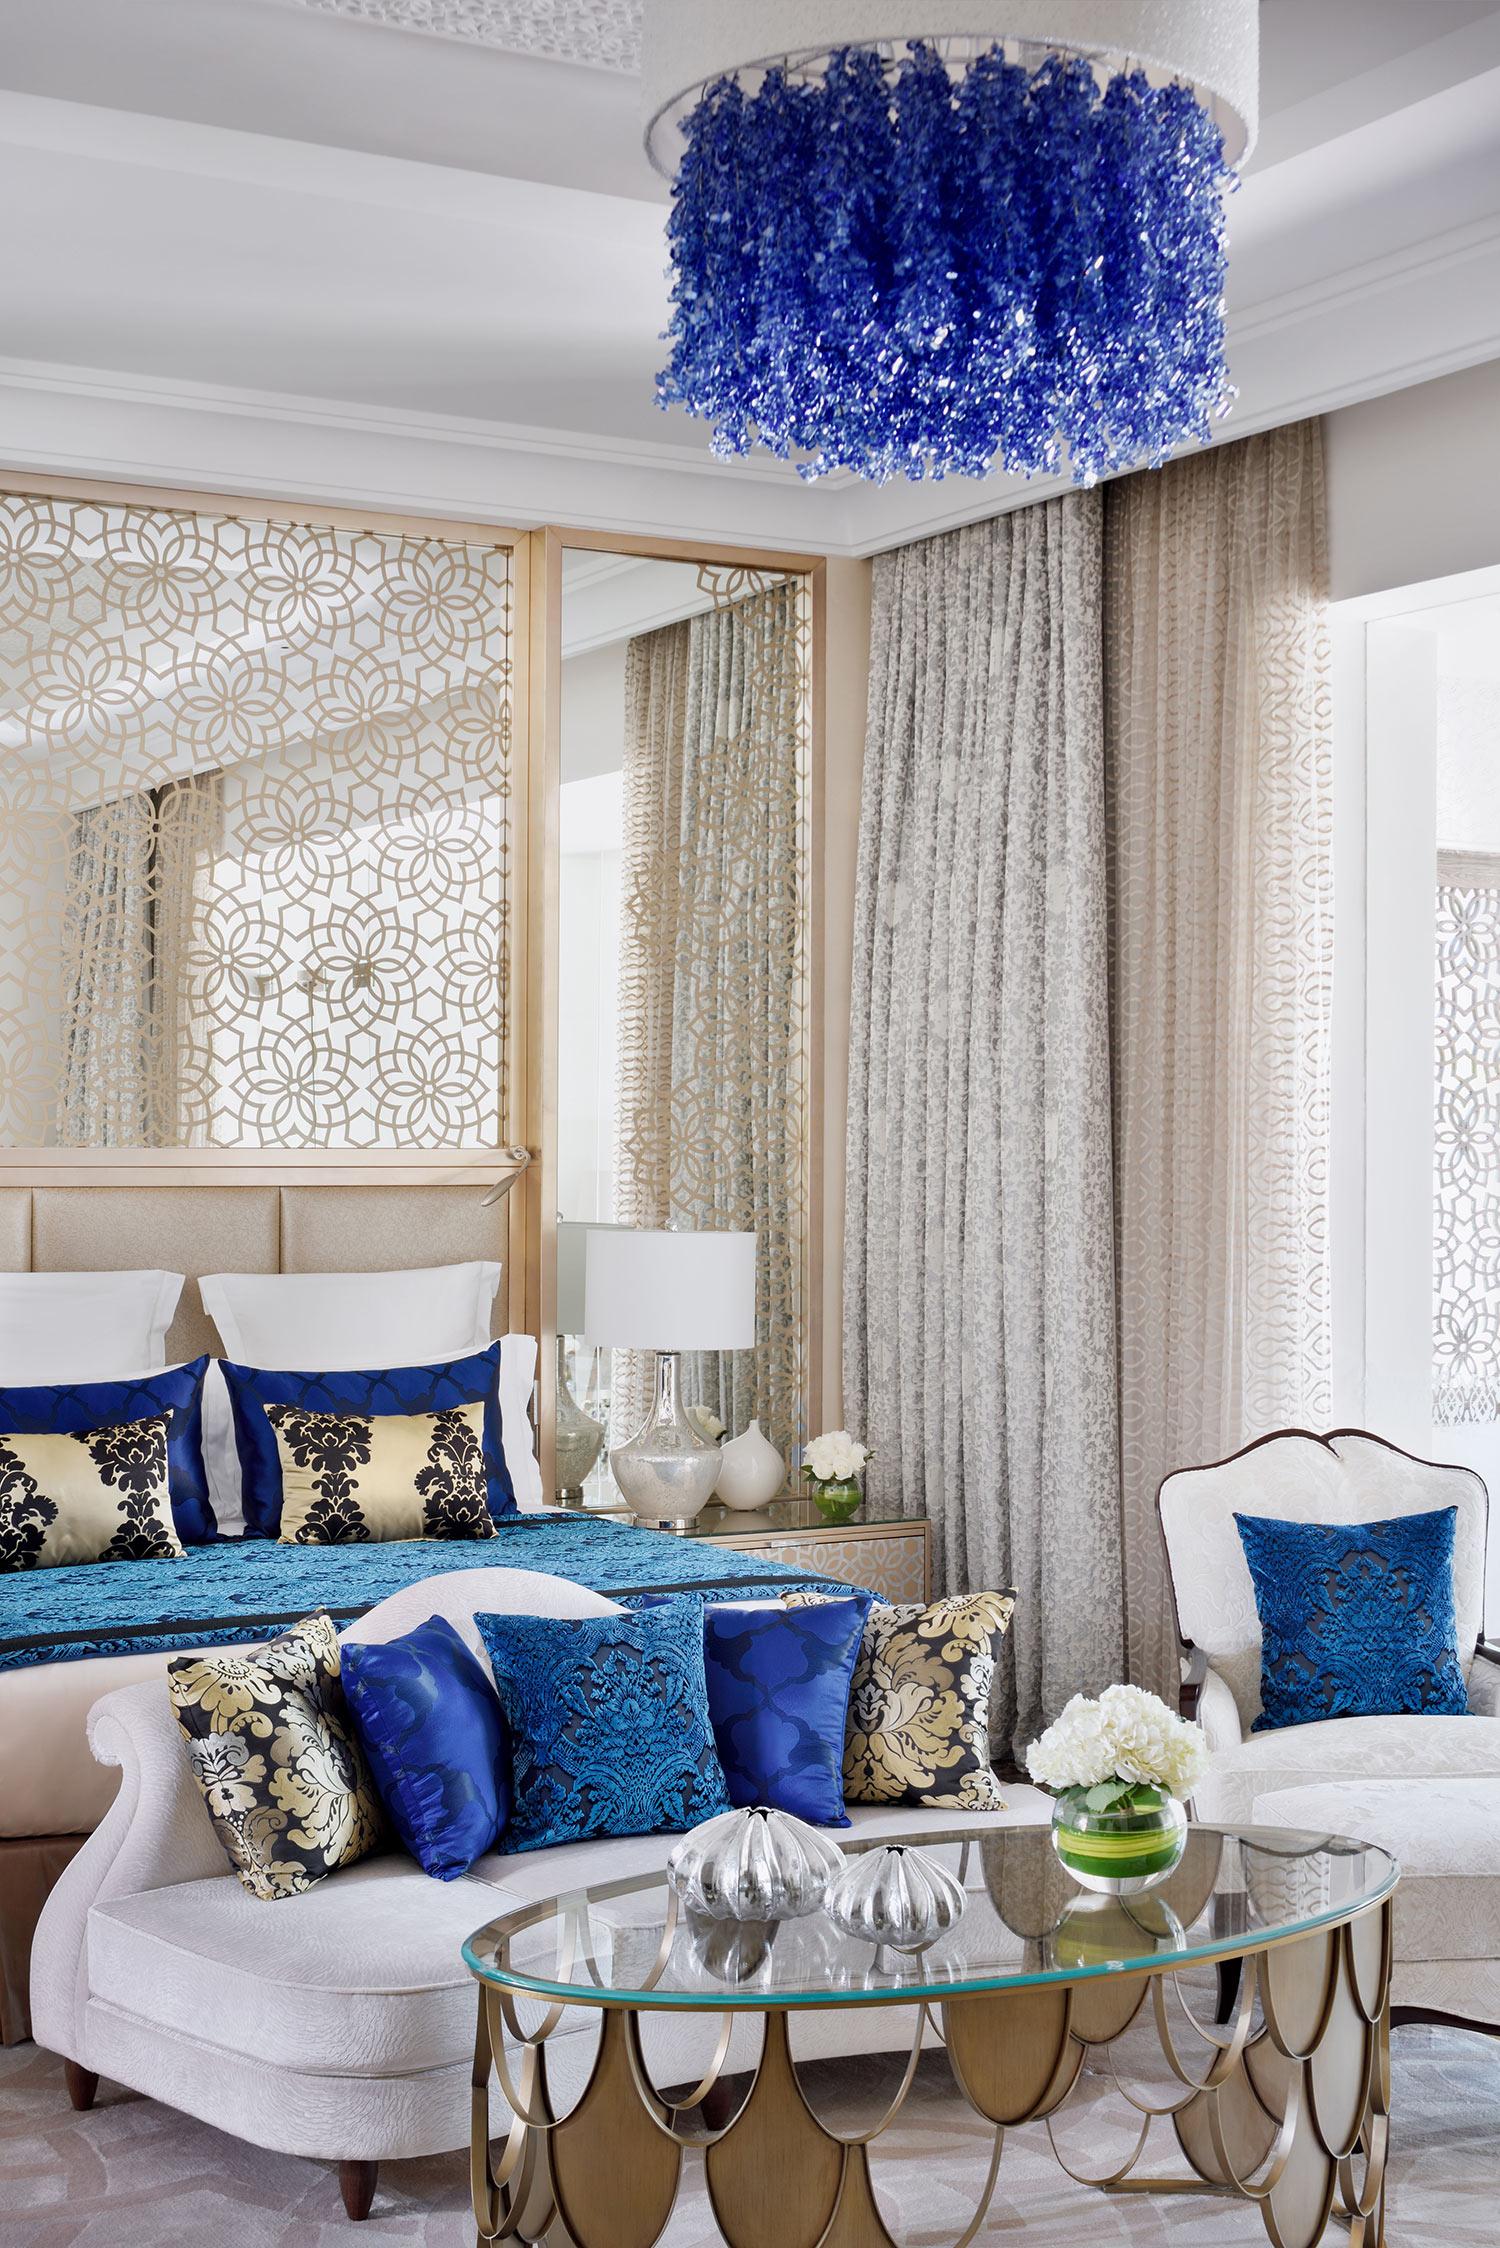 oo_royal_mirage_residence_and_spa_beach_garden_villa_master_bedroom_details_28_9_2017.jpg